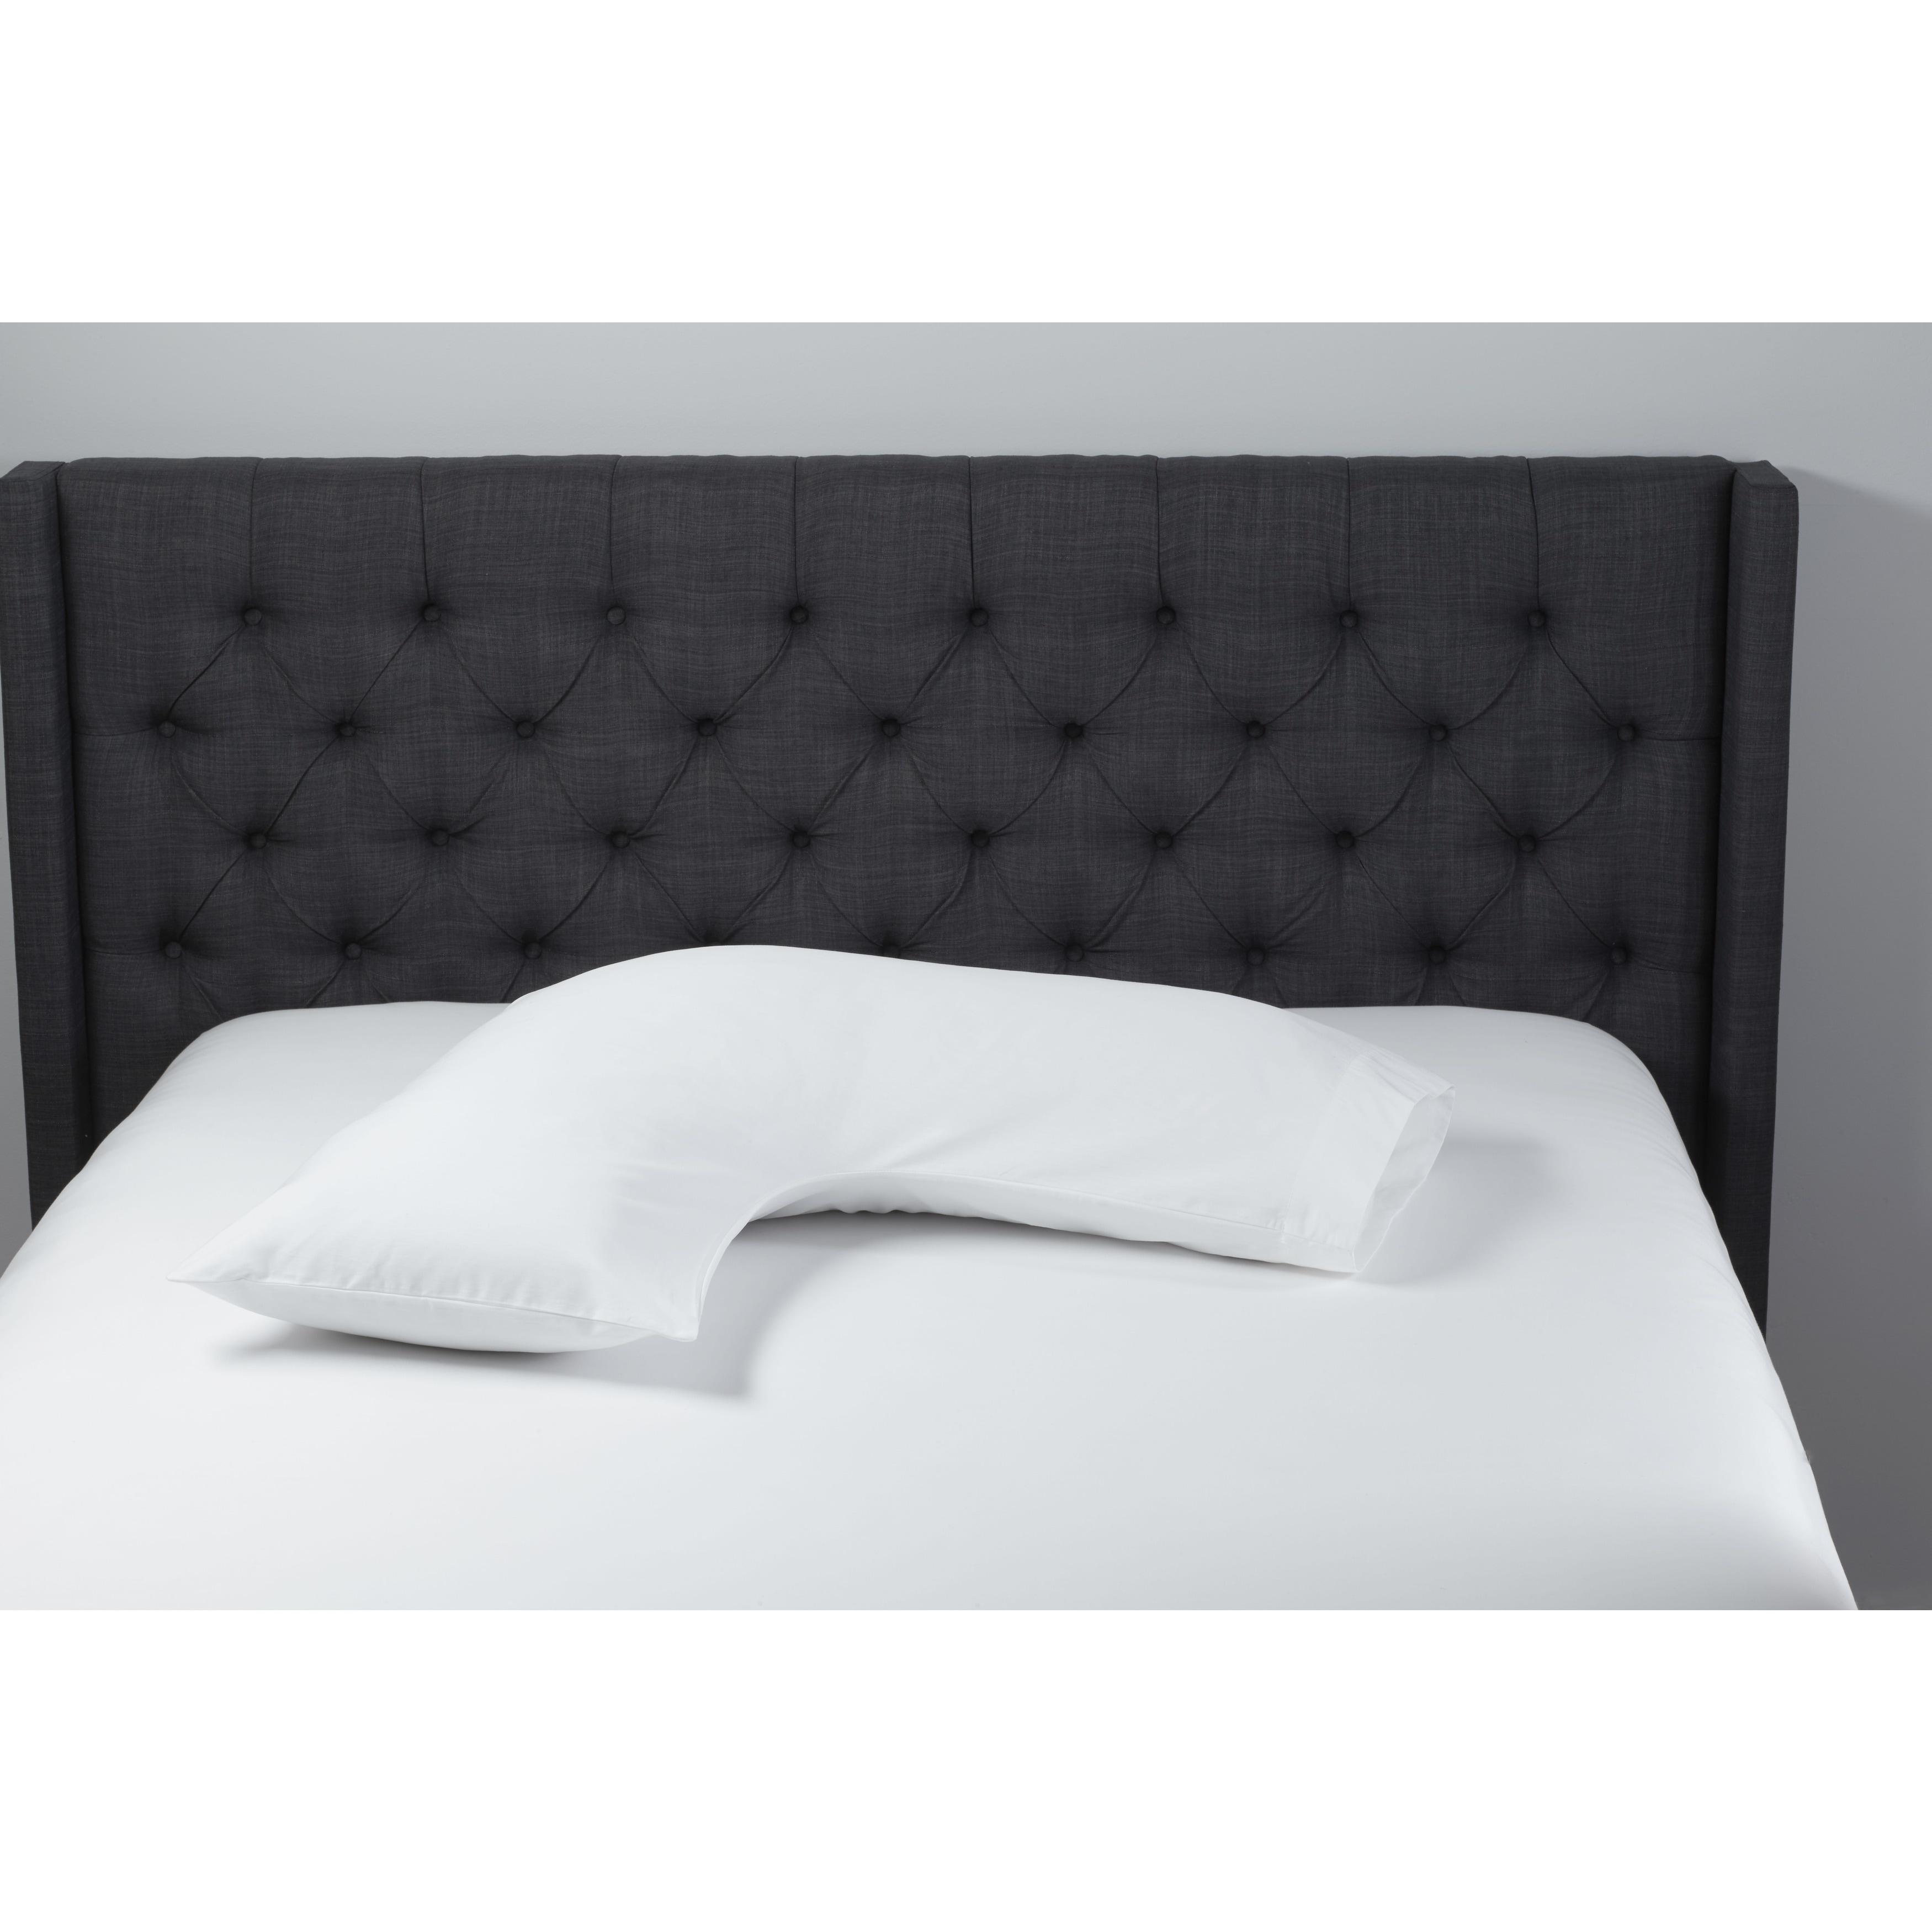 Hypoallergenic Boomerang Body Pillow (Boomer), White